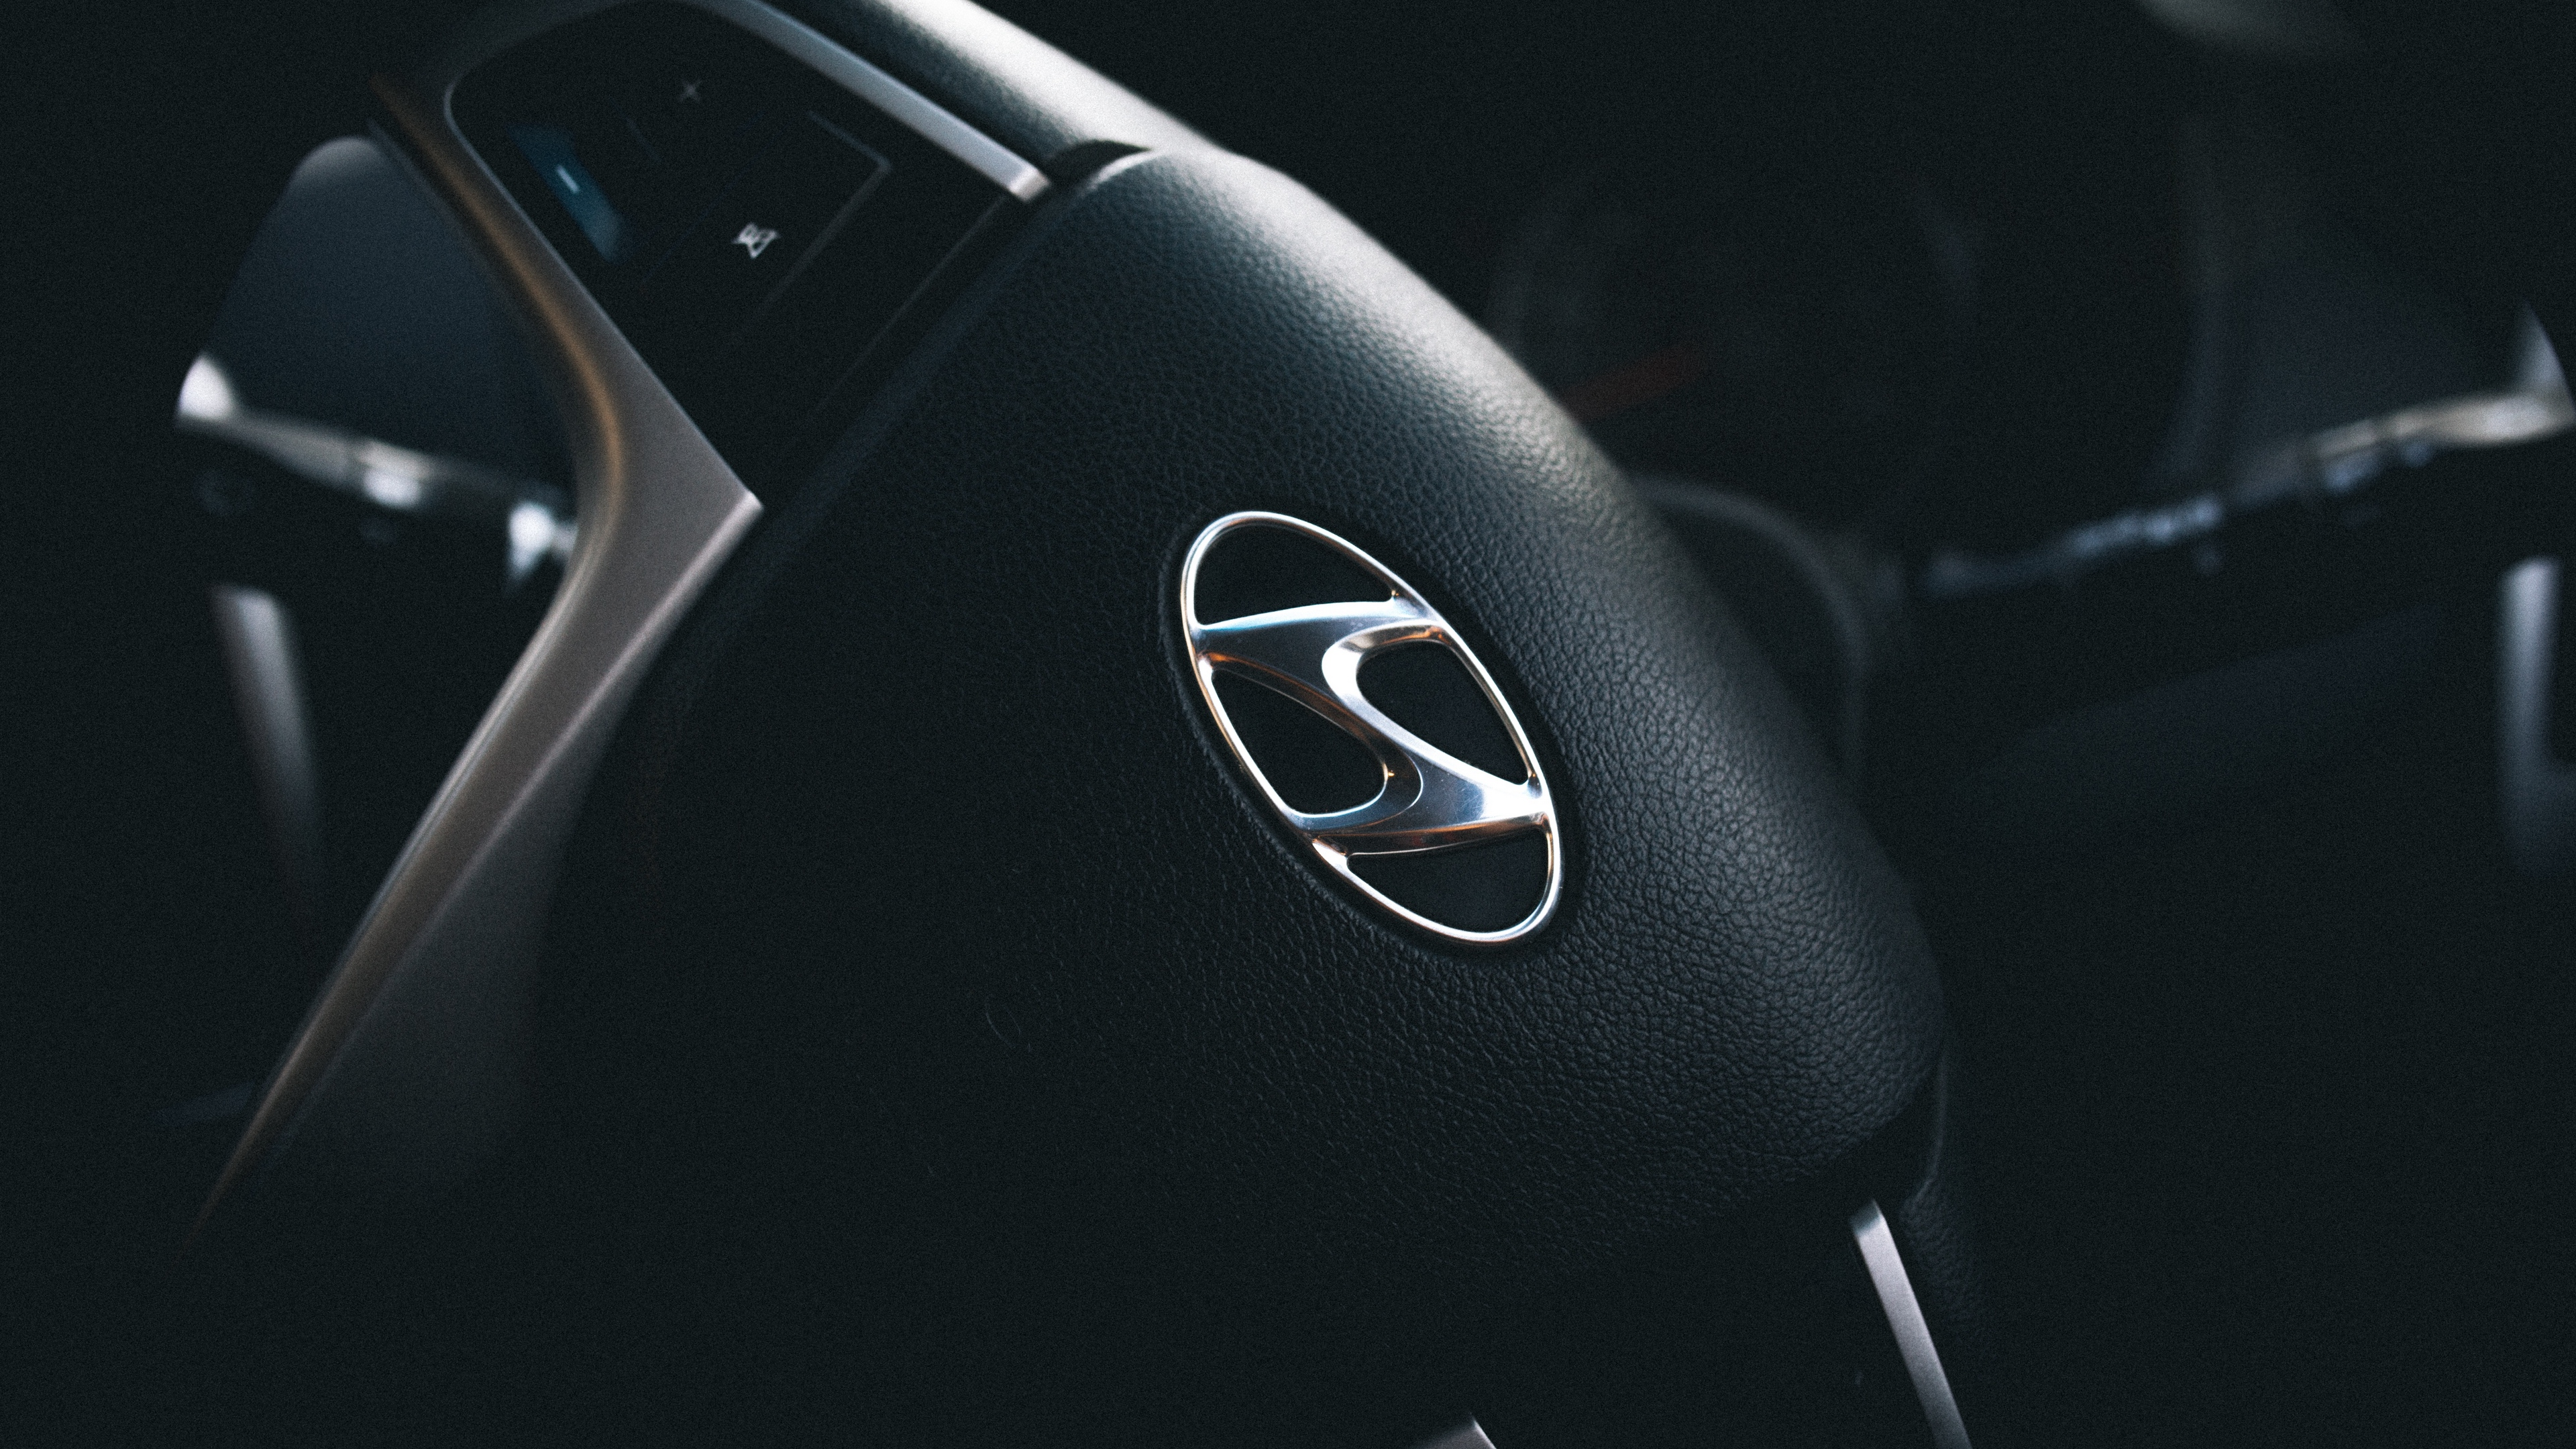 Download wallpaper 3840x2160 hyundai steering wheel logo 4k uhd 3840x2160